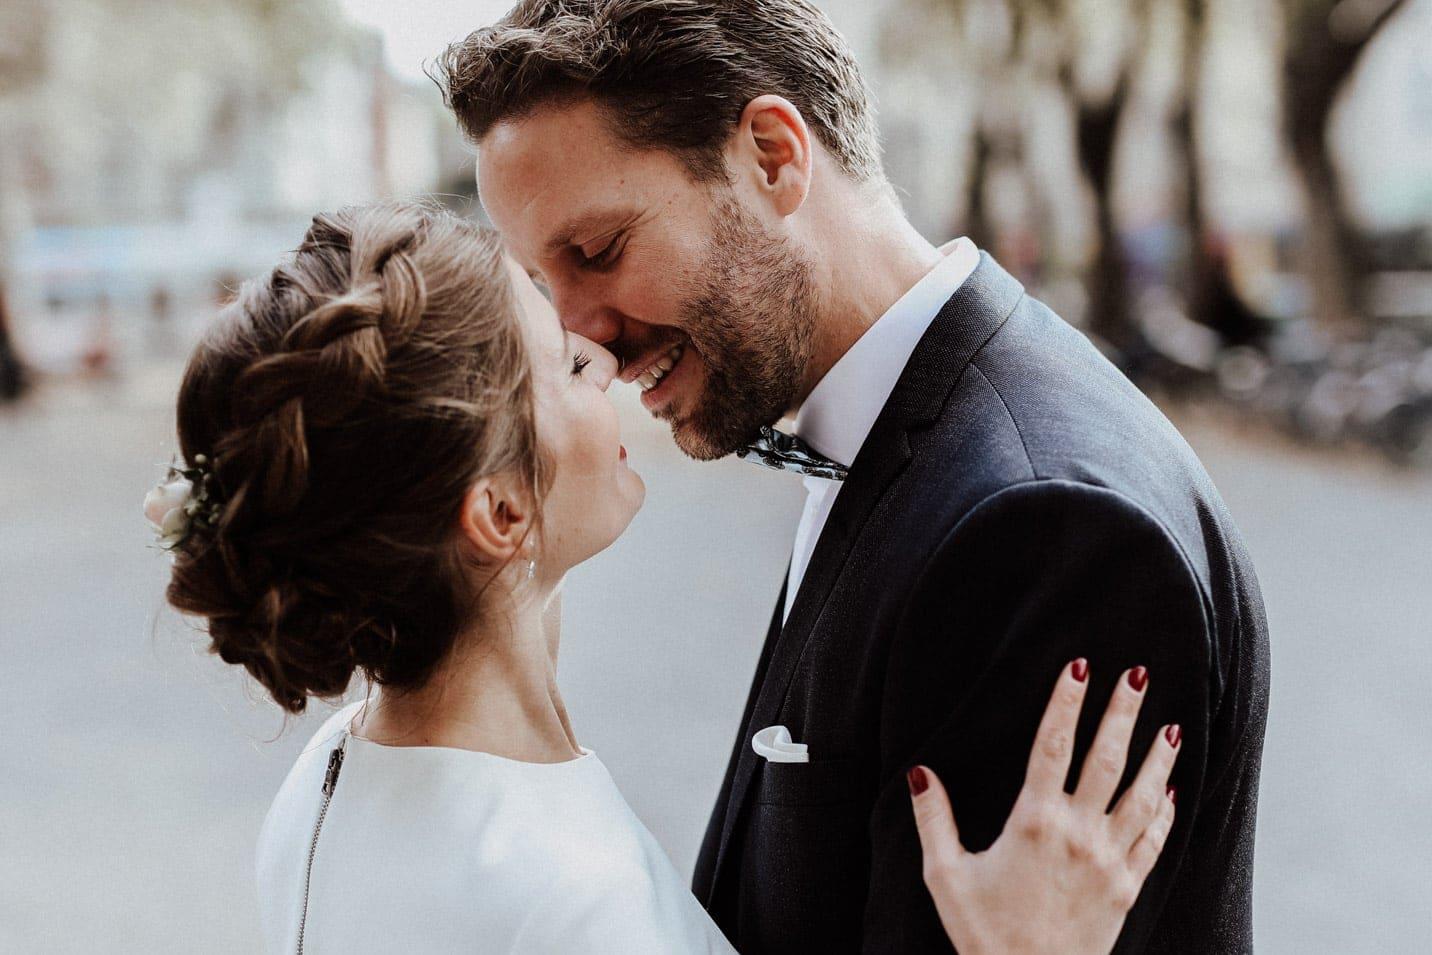 Brautpaar kurz vor dem Kuss Brautpaarfotos Hochzeitsfotograf Koeln